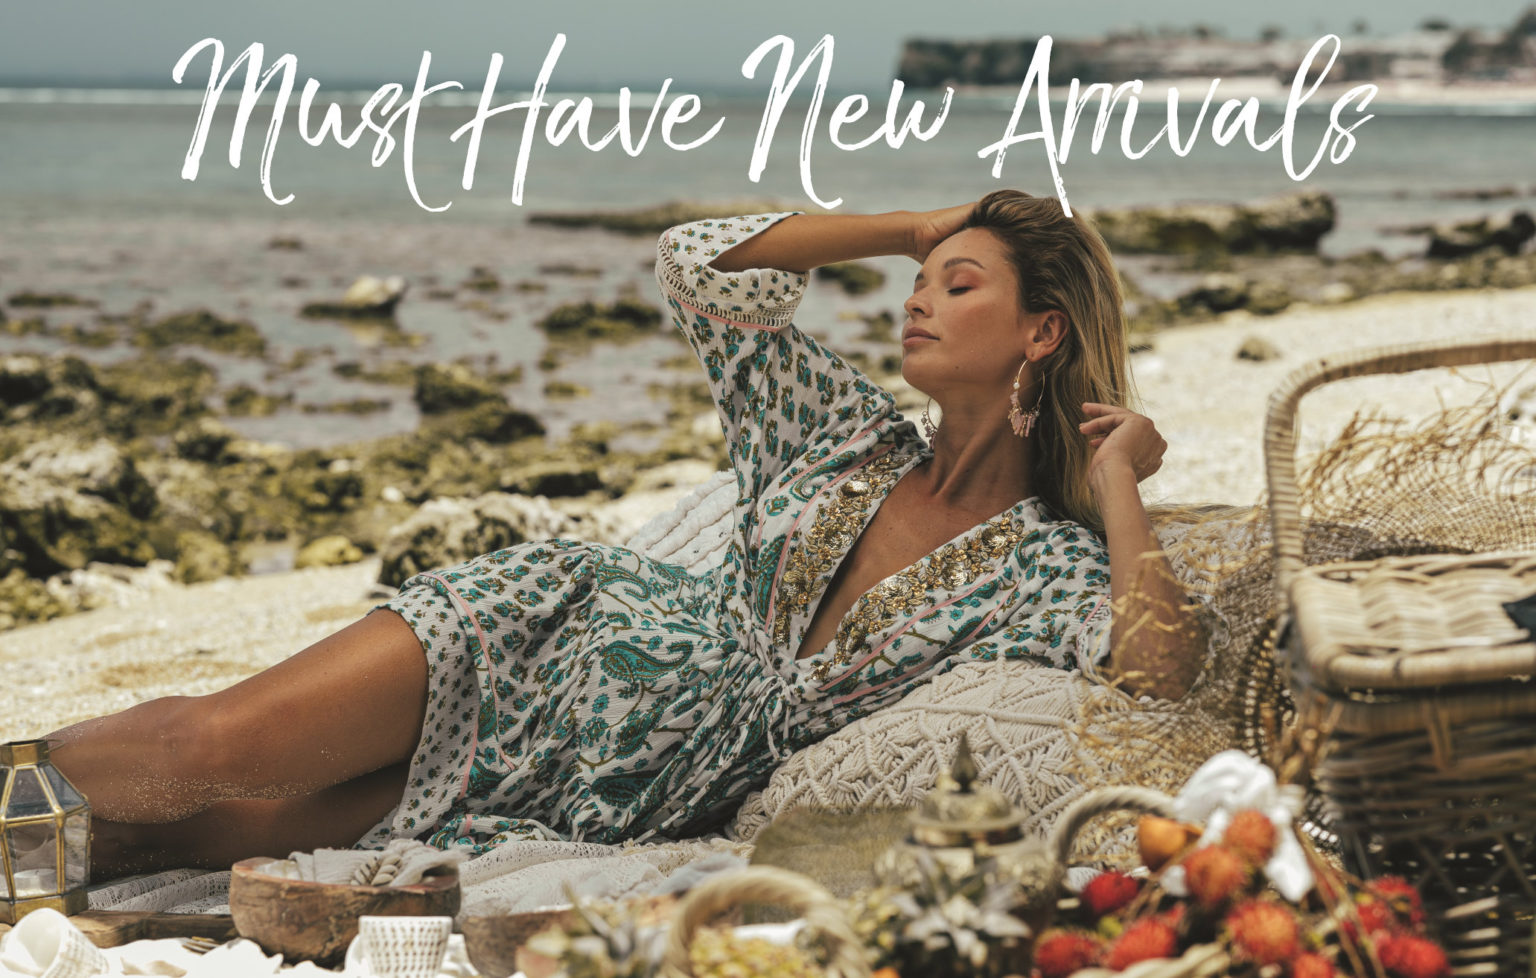 Beach Cafe Her Luxury Wellness 03